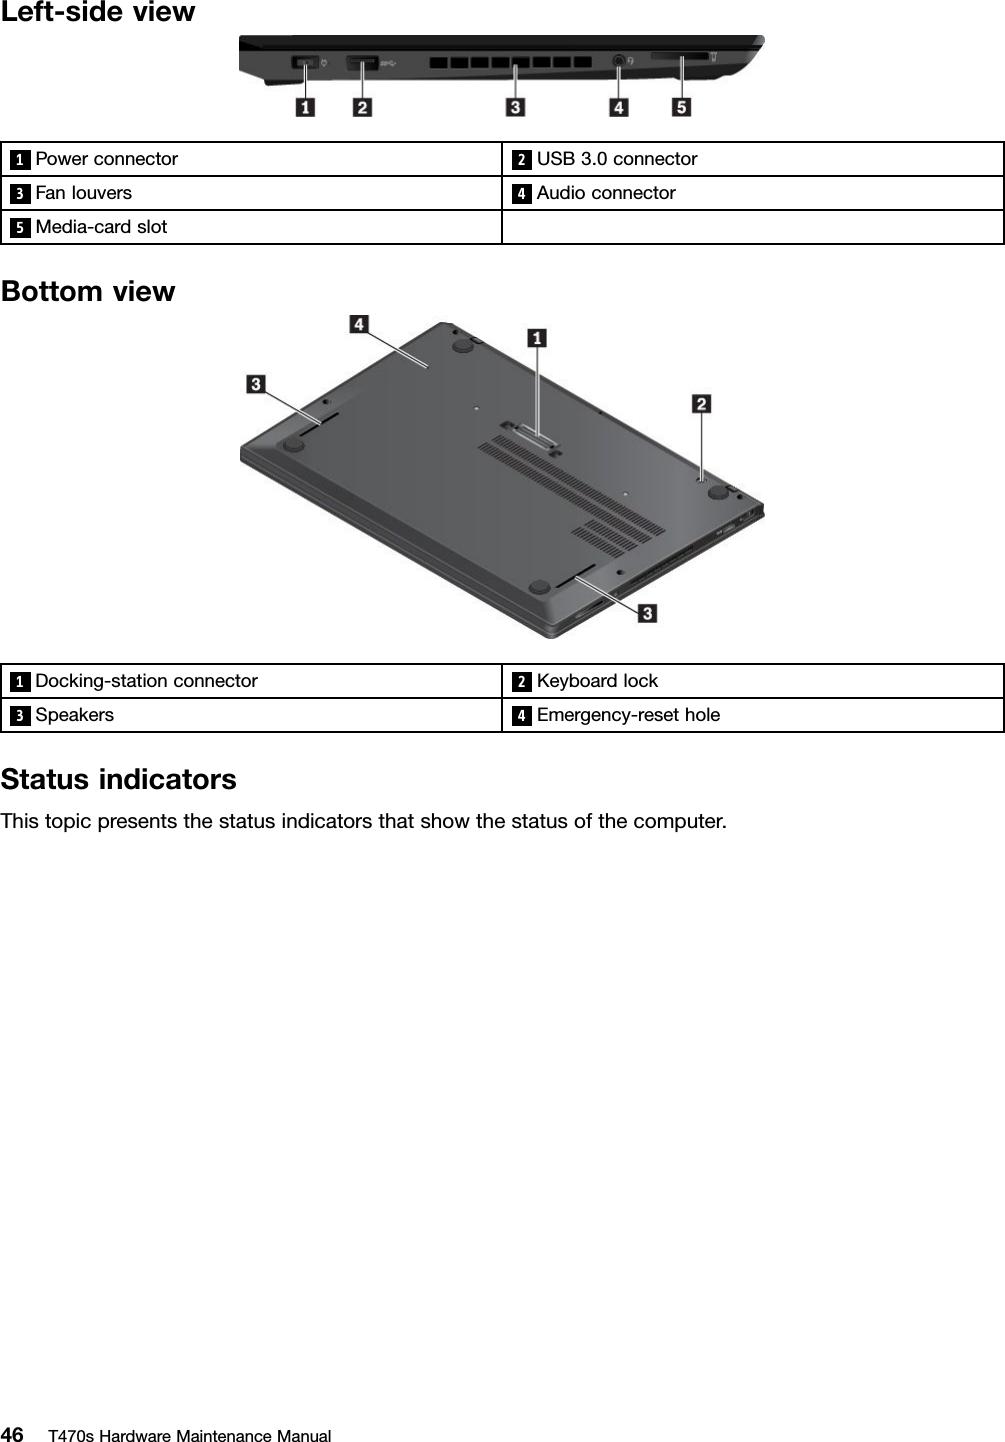 Lenovo T470S Hmm En Sp40J65619 03 User Manual Hardware